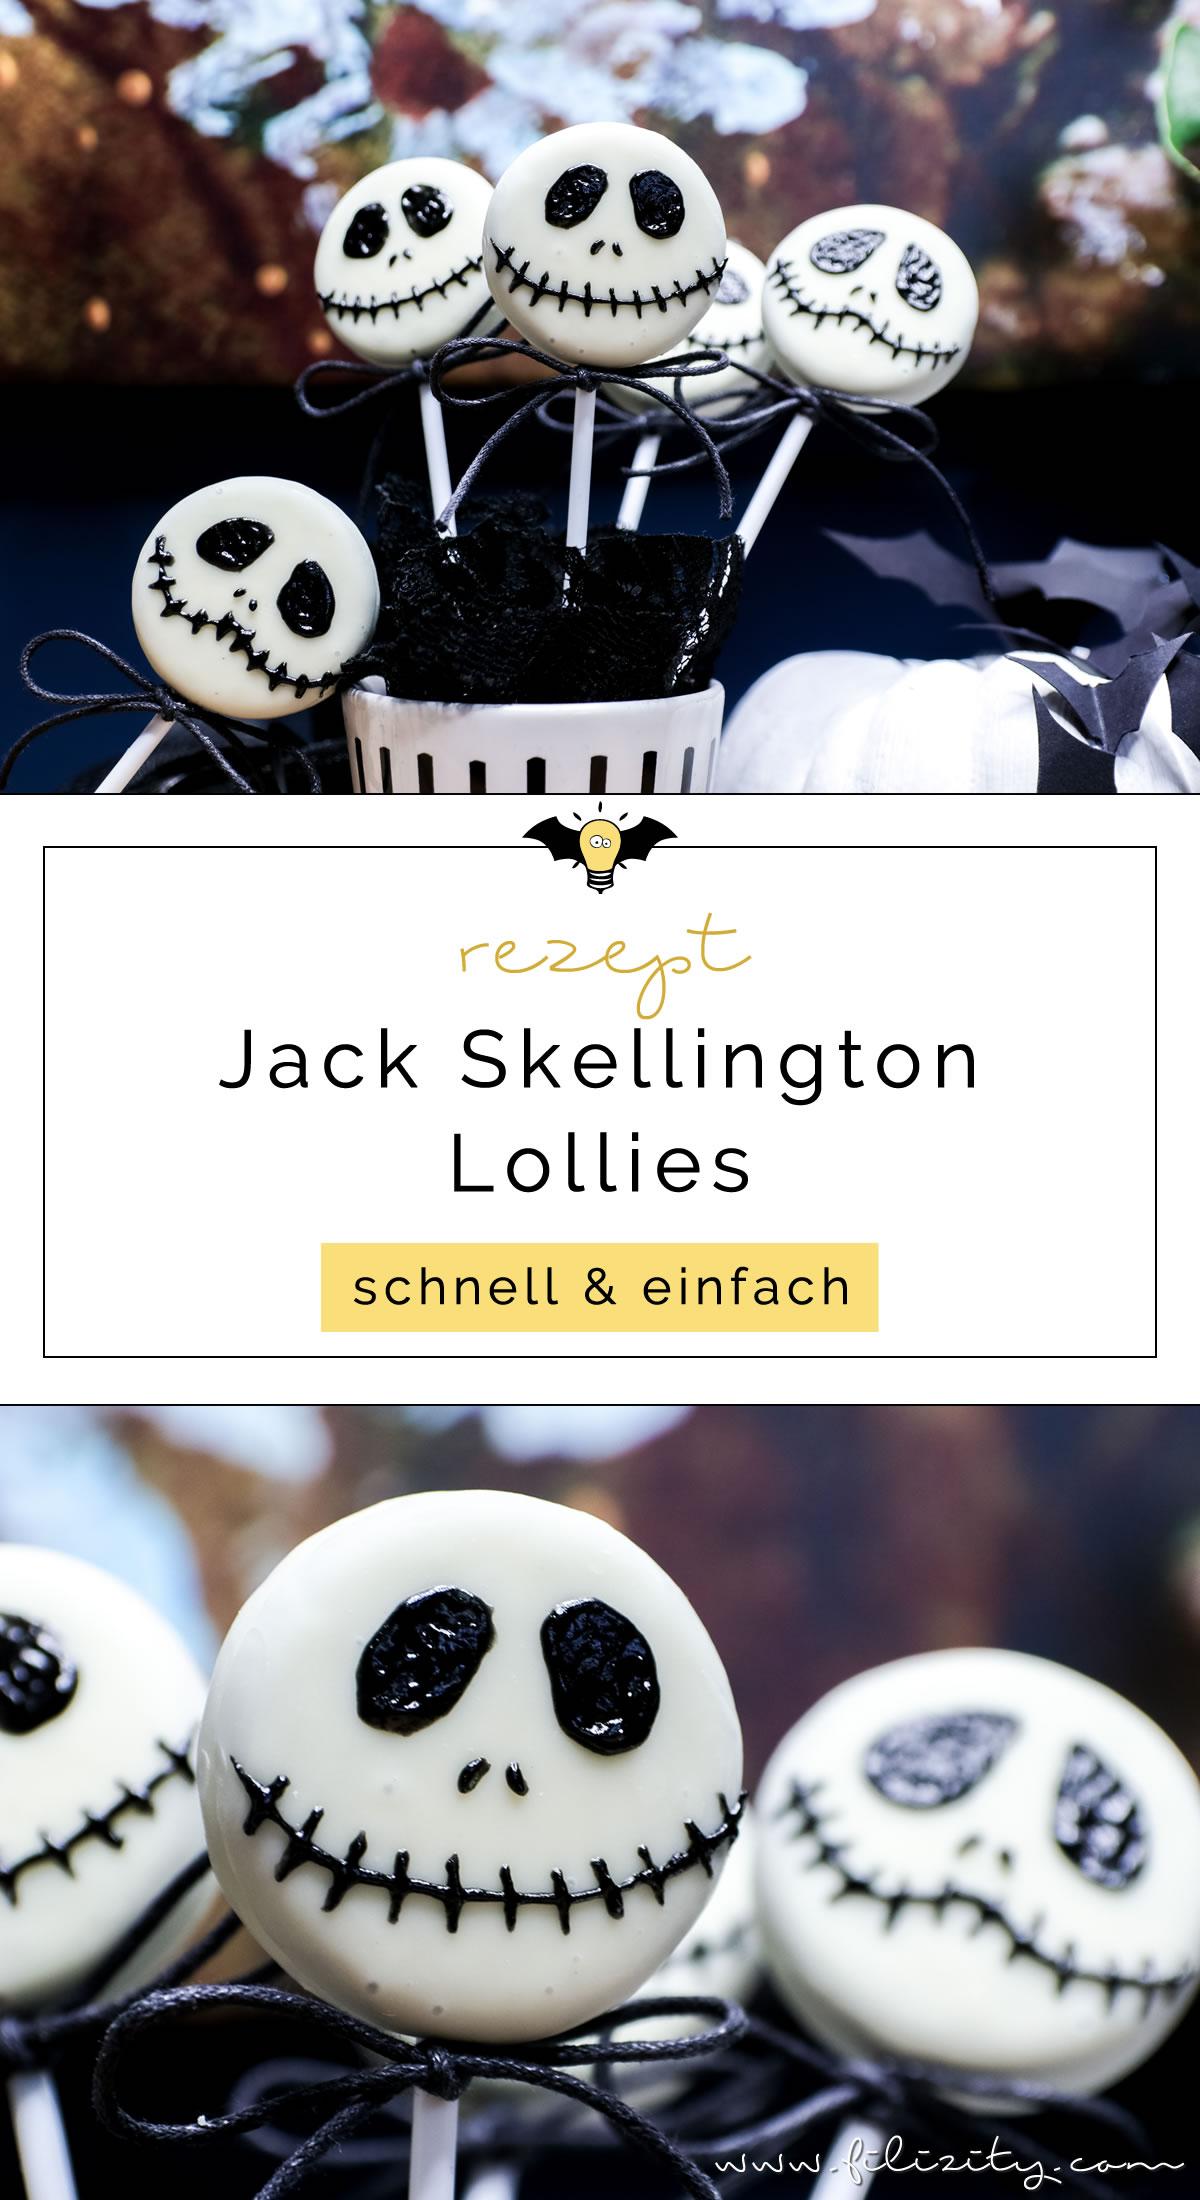 Schnelles Halloween-Rezept: Jack Skellington Keks Lollies | Filizity.com | Food-Blog aus dem Rheinland #halloween #booh #oreo #partyfood